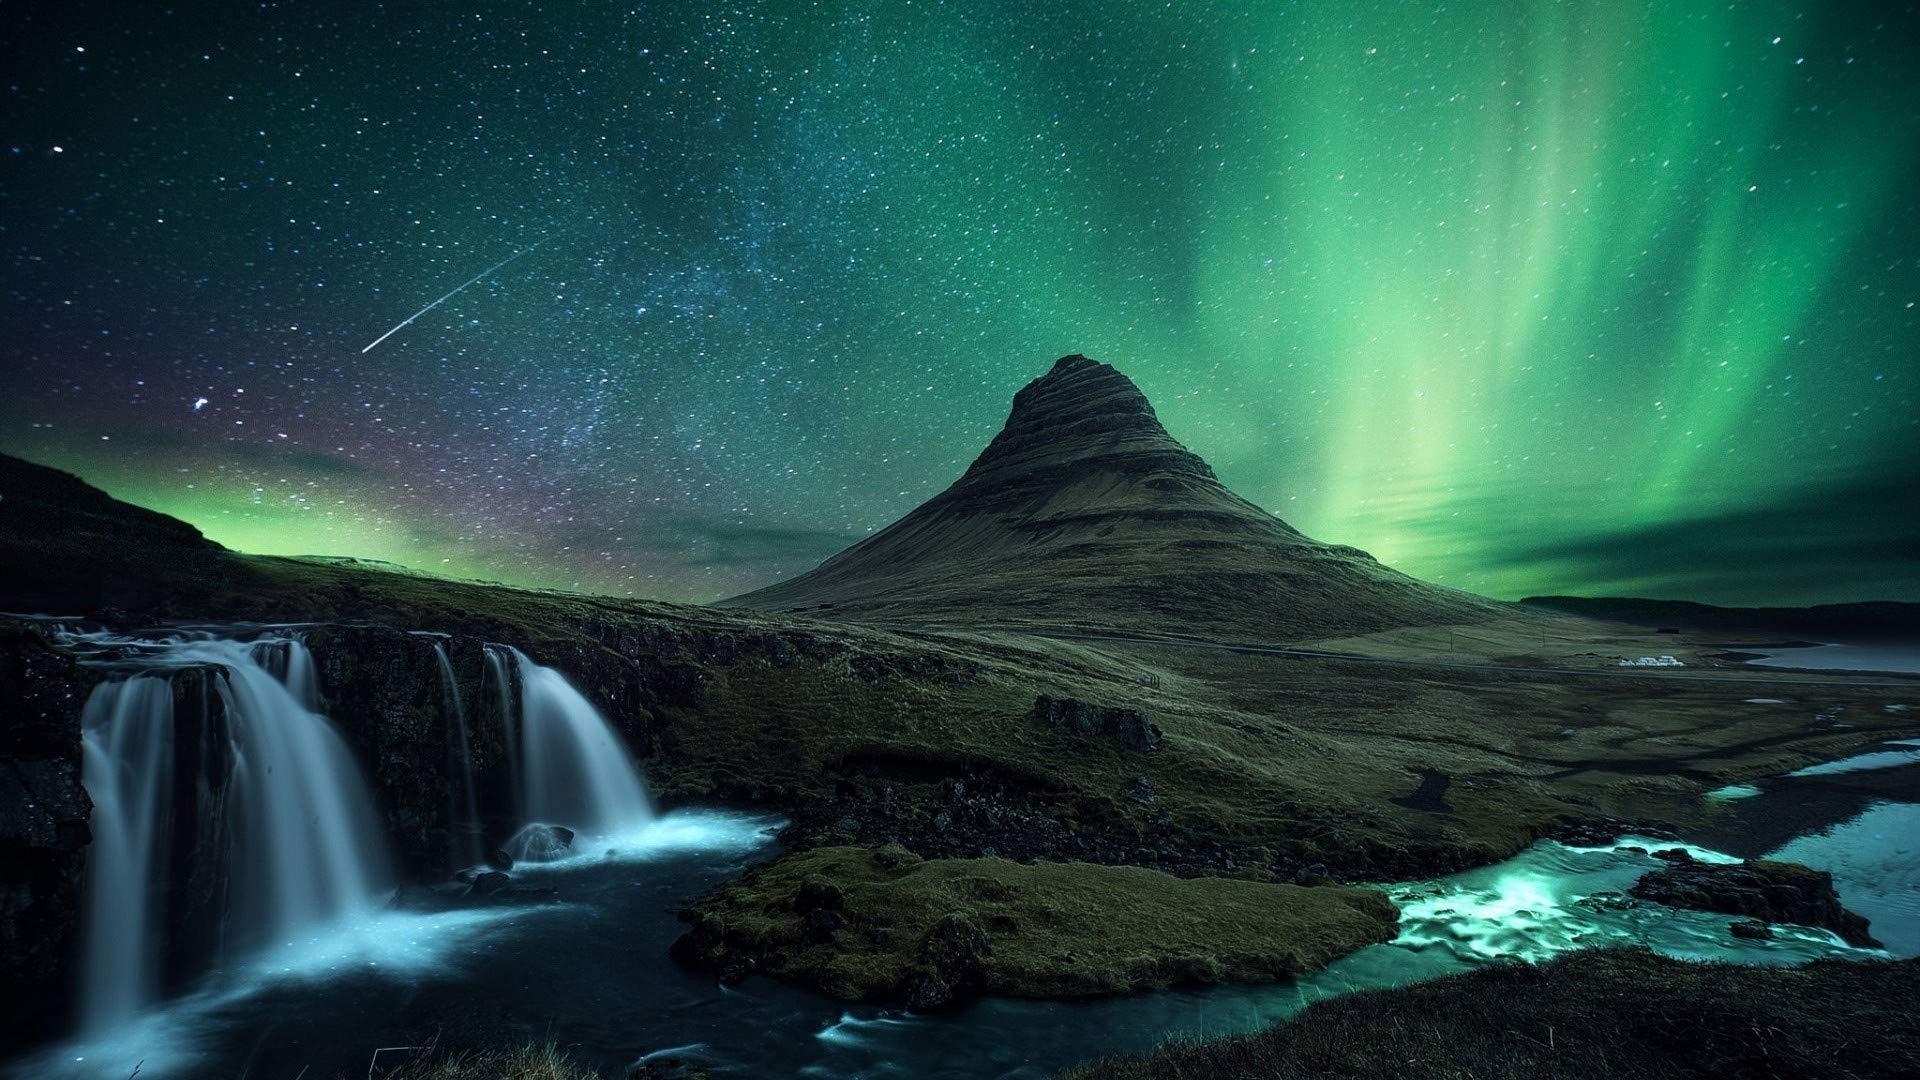 ZSFFSZ Jigsaw Puzzle 1000 Piece Iceland Volcano Rock Waterfall Night Star Northern Lights Gift Diy Modern Wall Art Unique Gift Home Decor